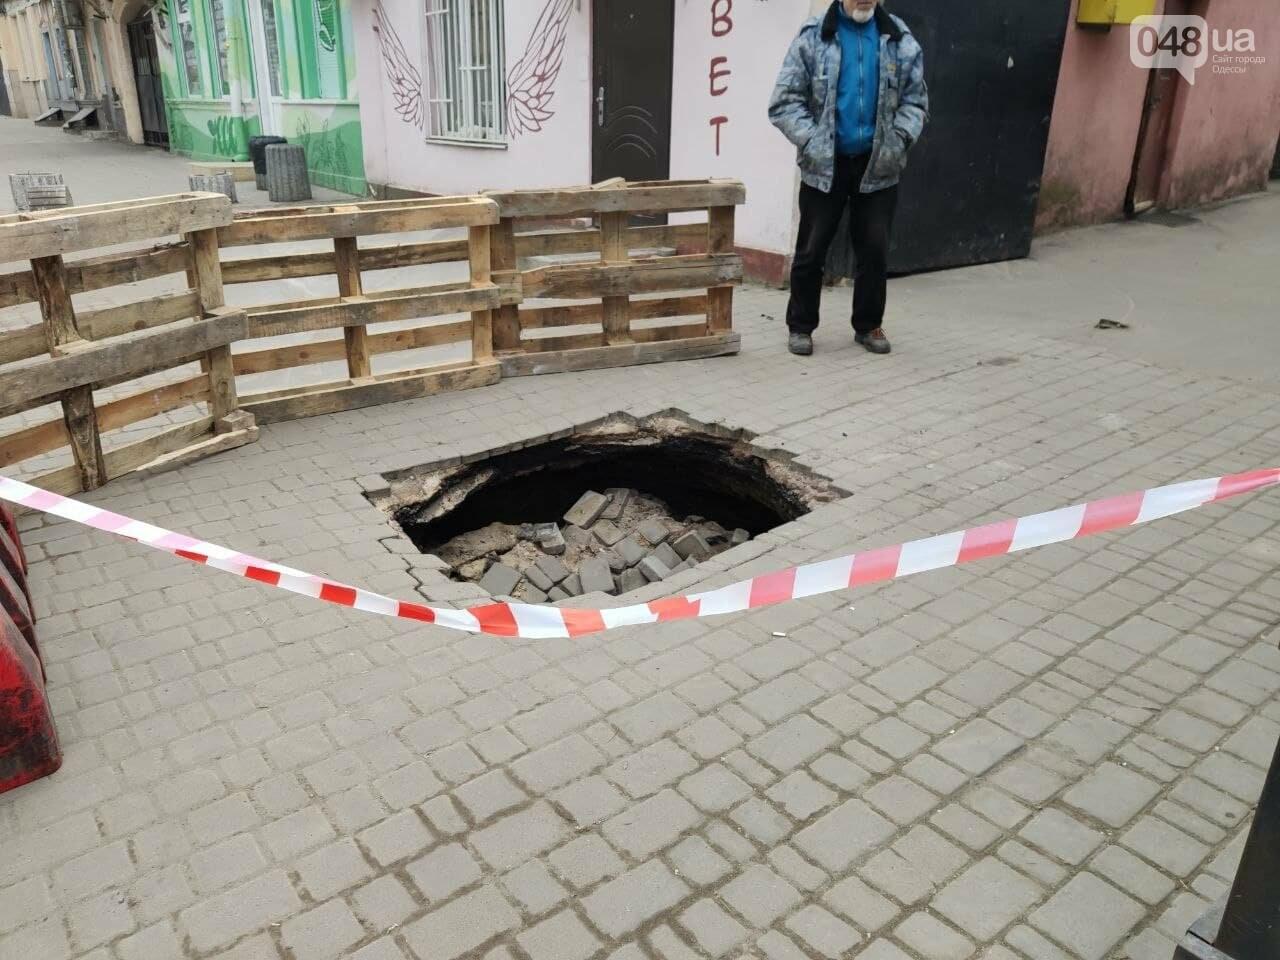 В центре Одессы провалился тротуар, - ФОТО, фото-3